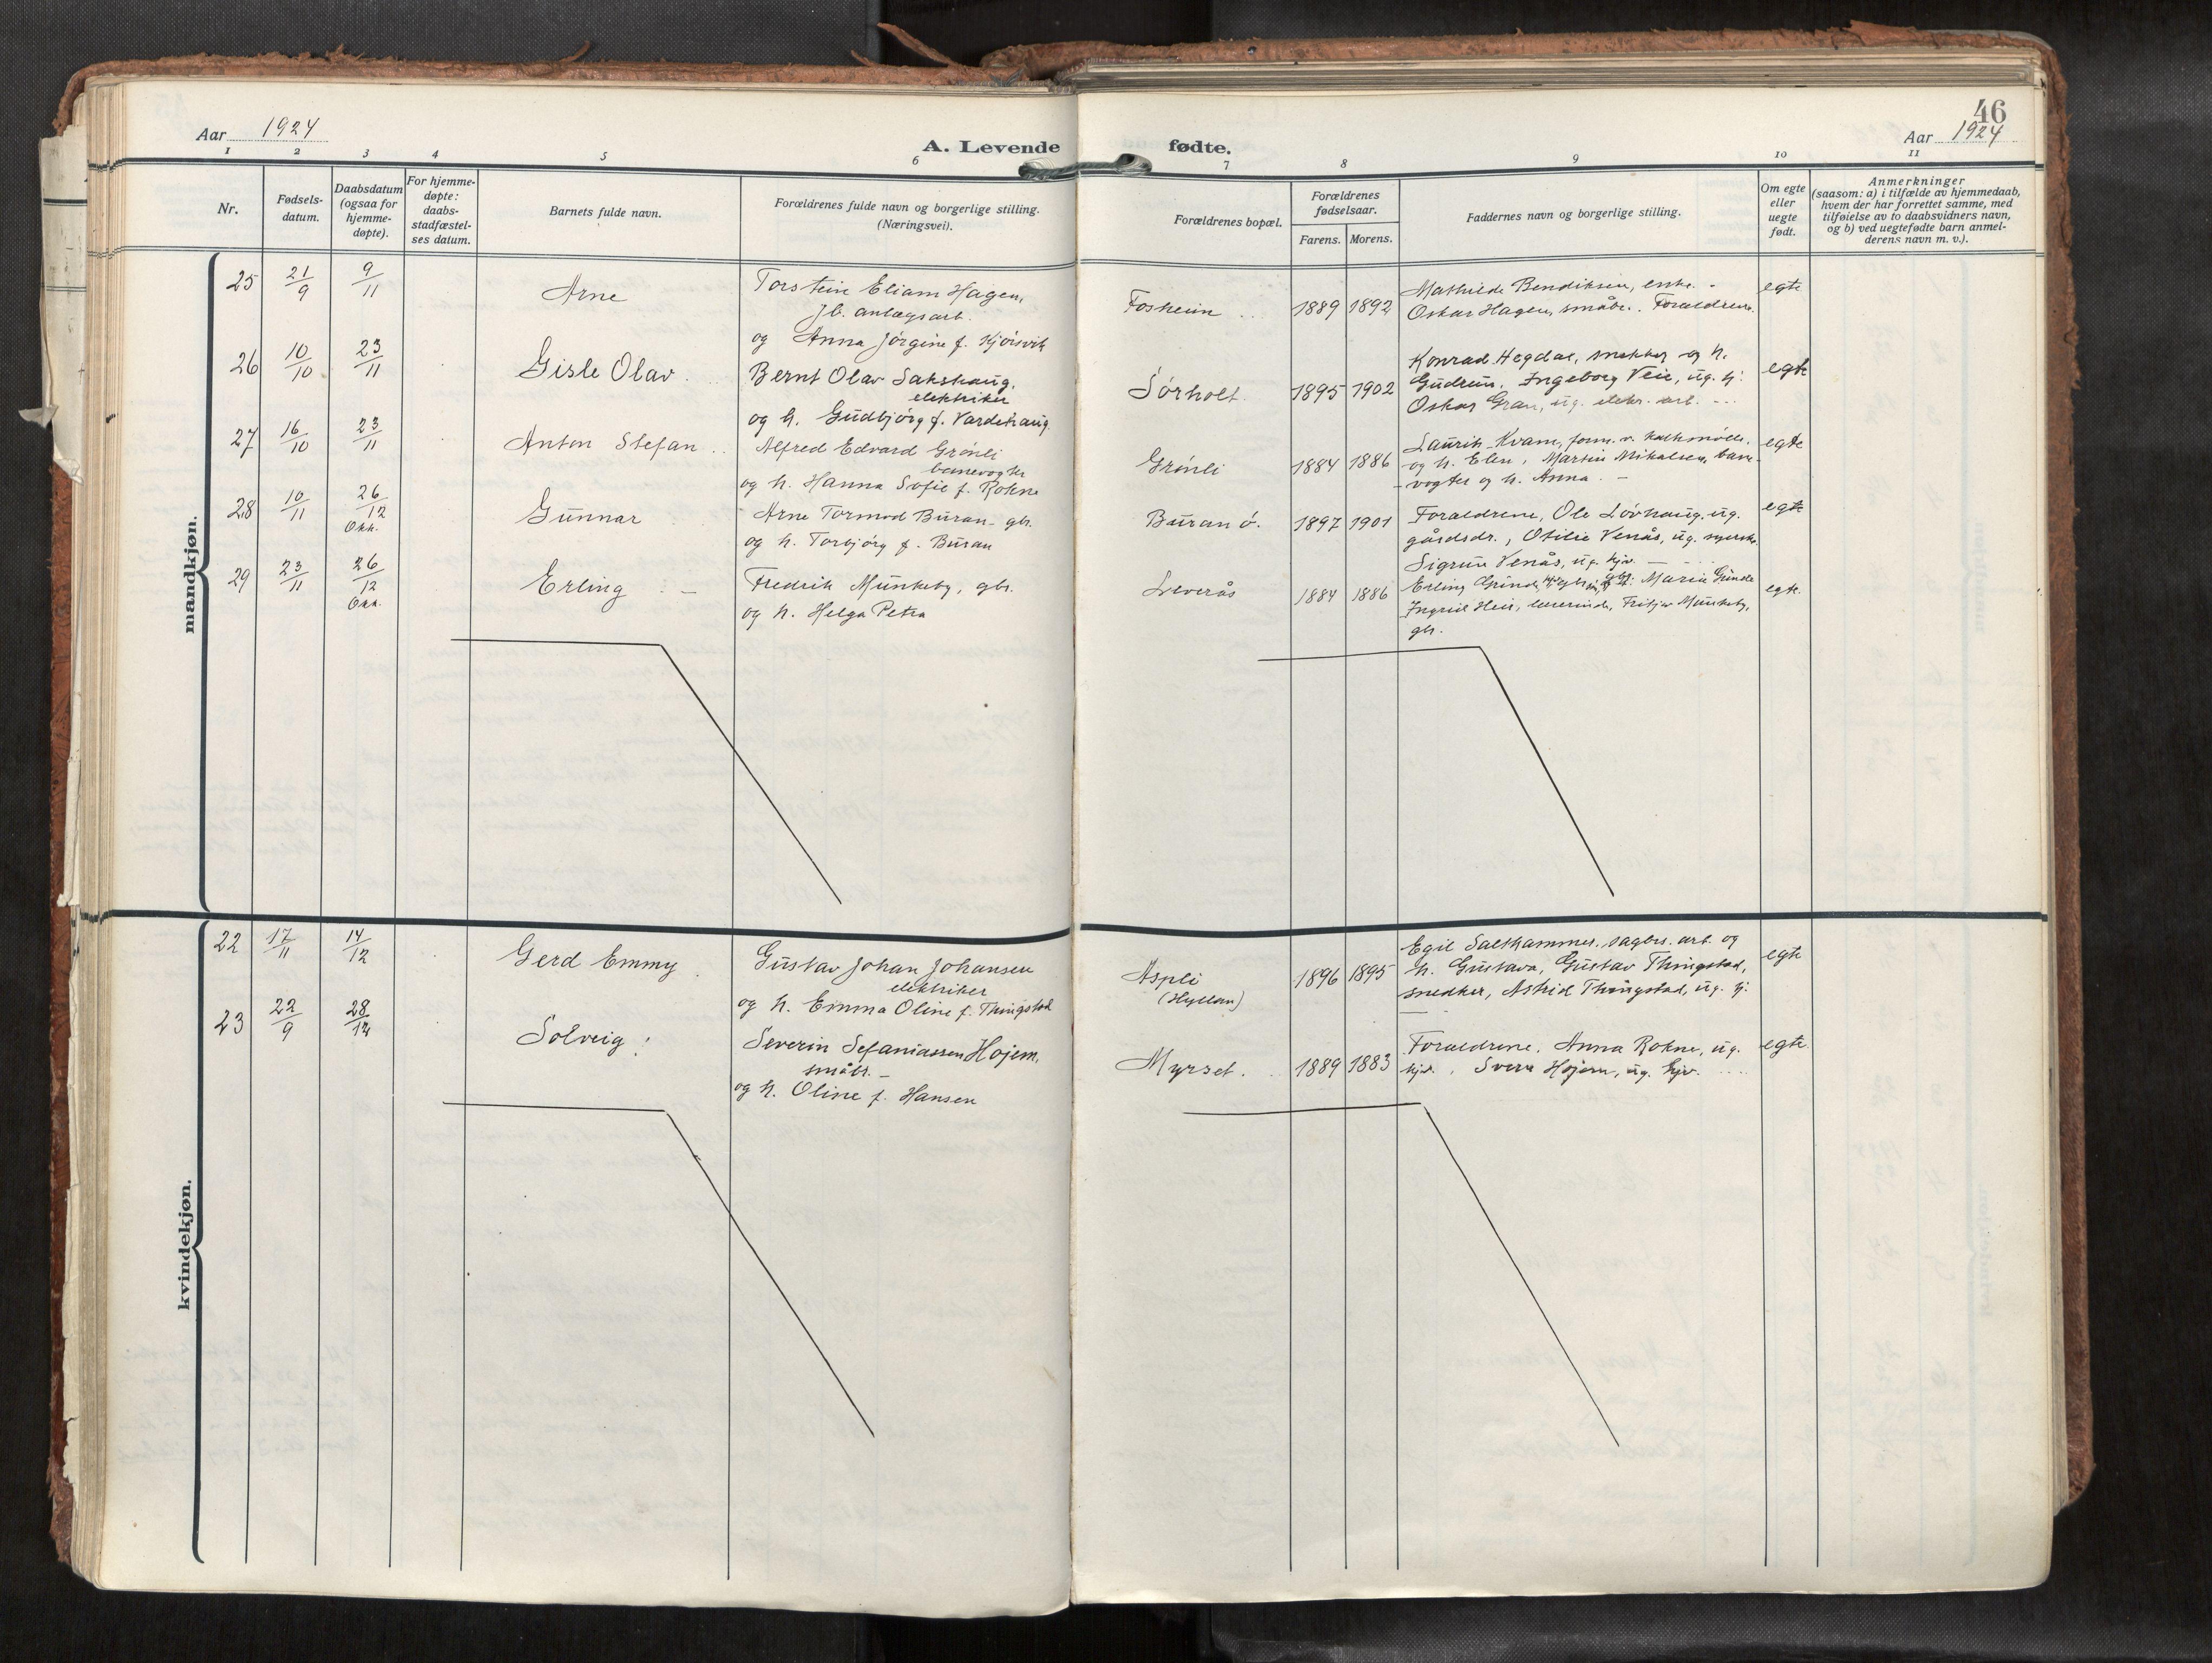 SAT, Levanger sokneprestkontor*, Parish register (official) no. 1, 1912-1935, p. 46